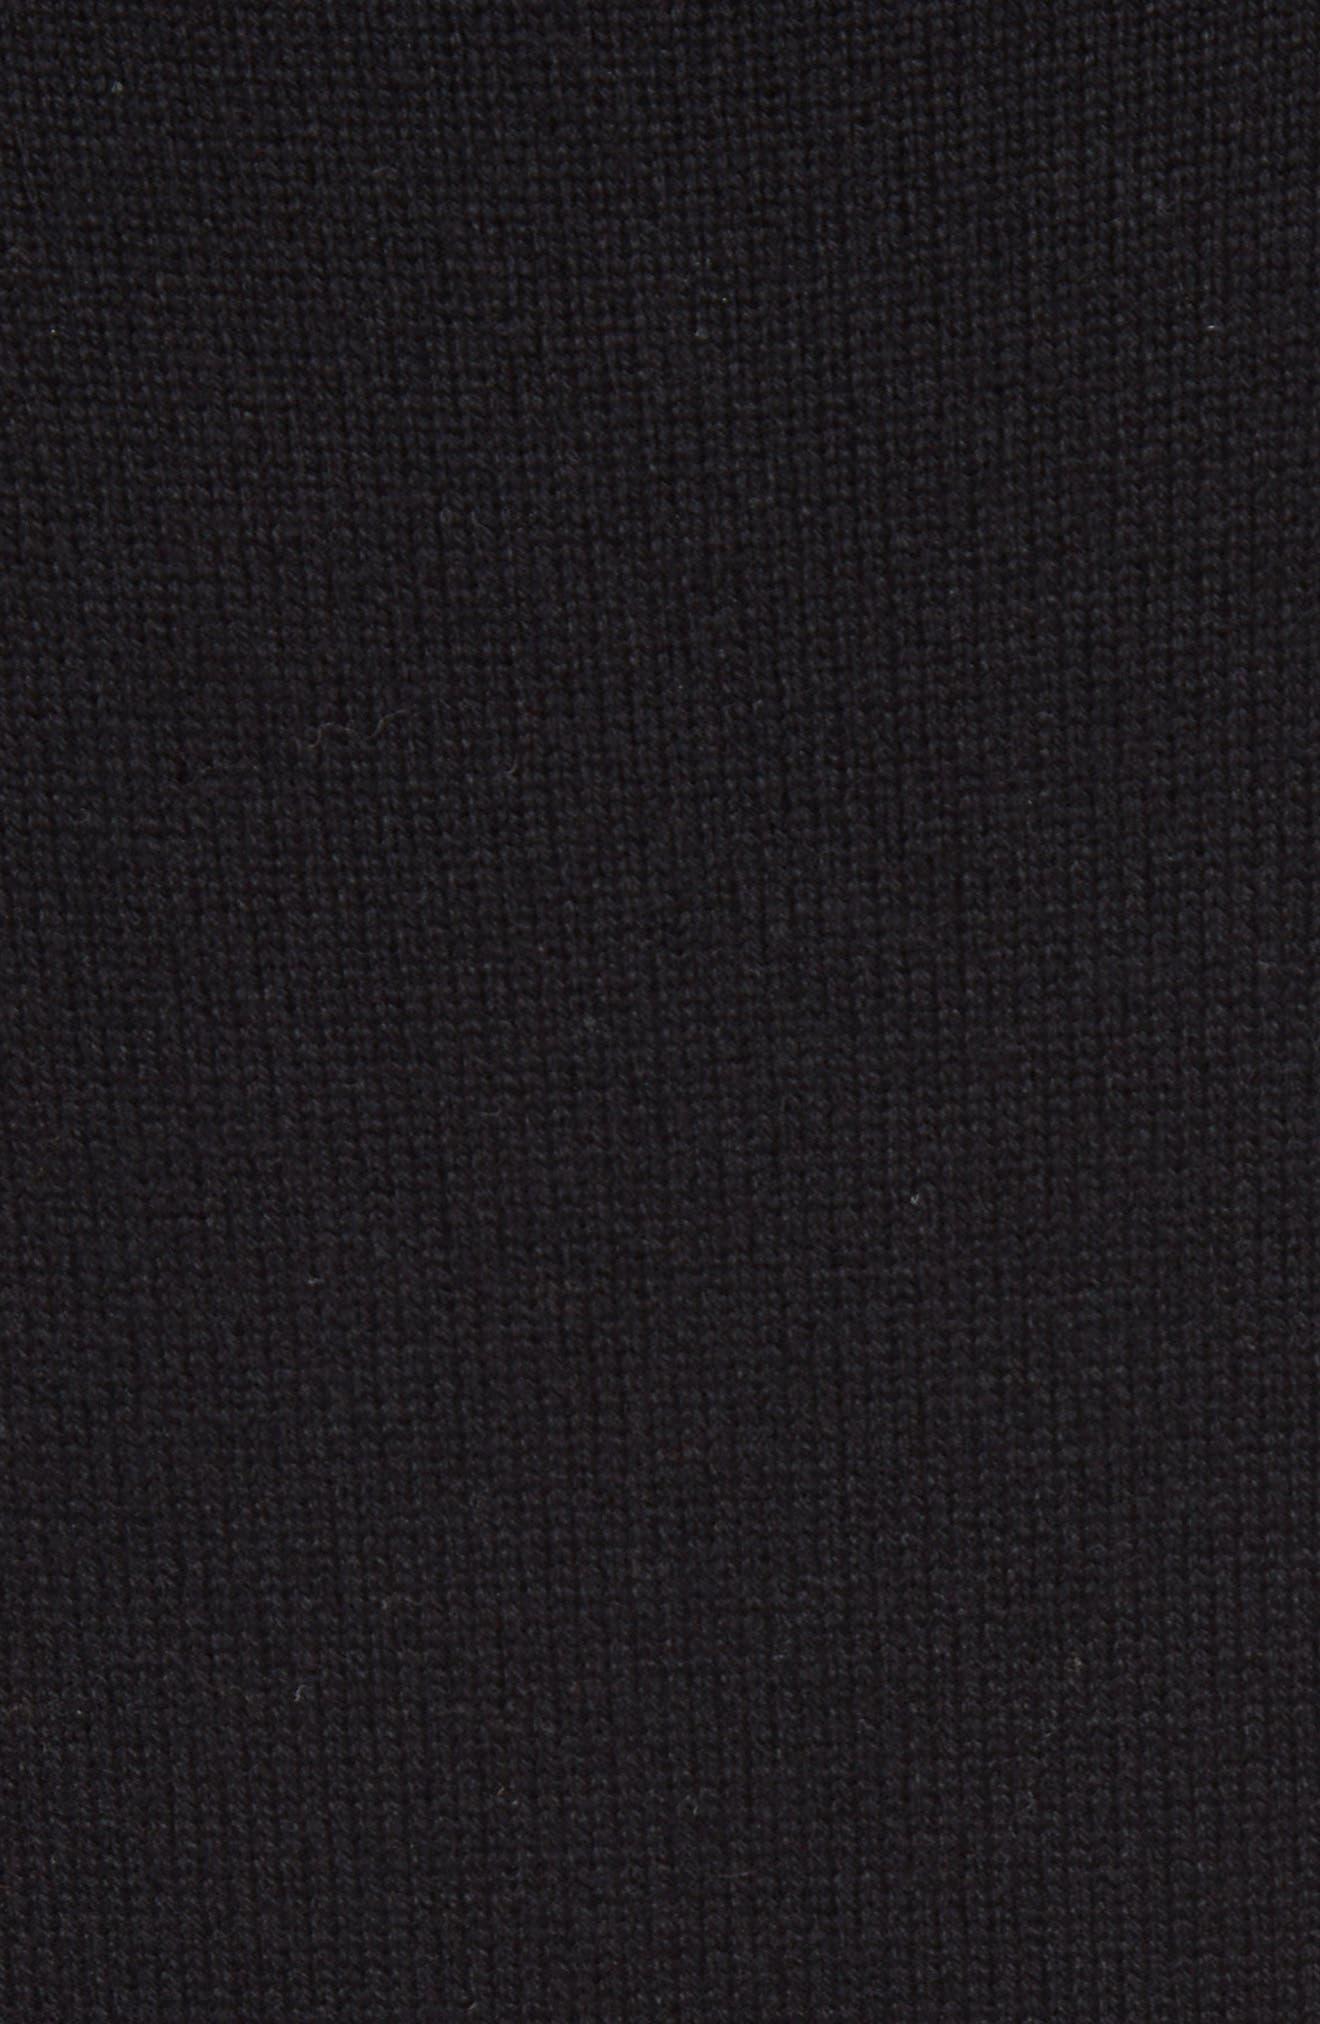 Alternate Image 3  - Chloé Cashmere Pleated Turtleneck Dress